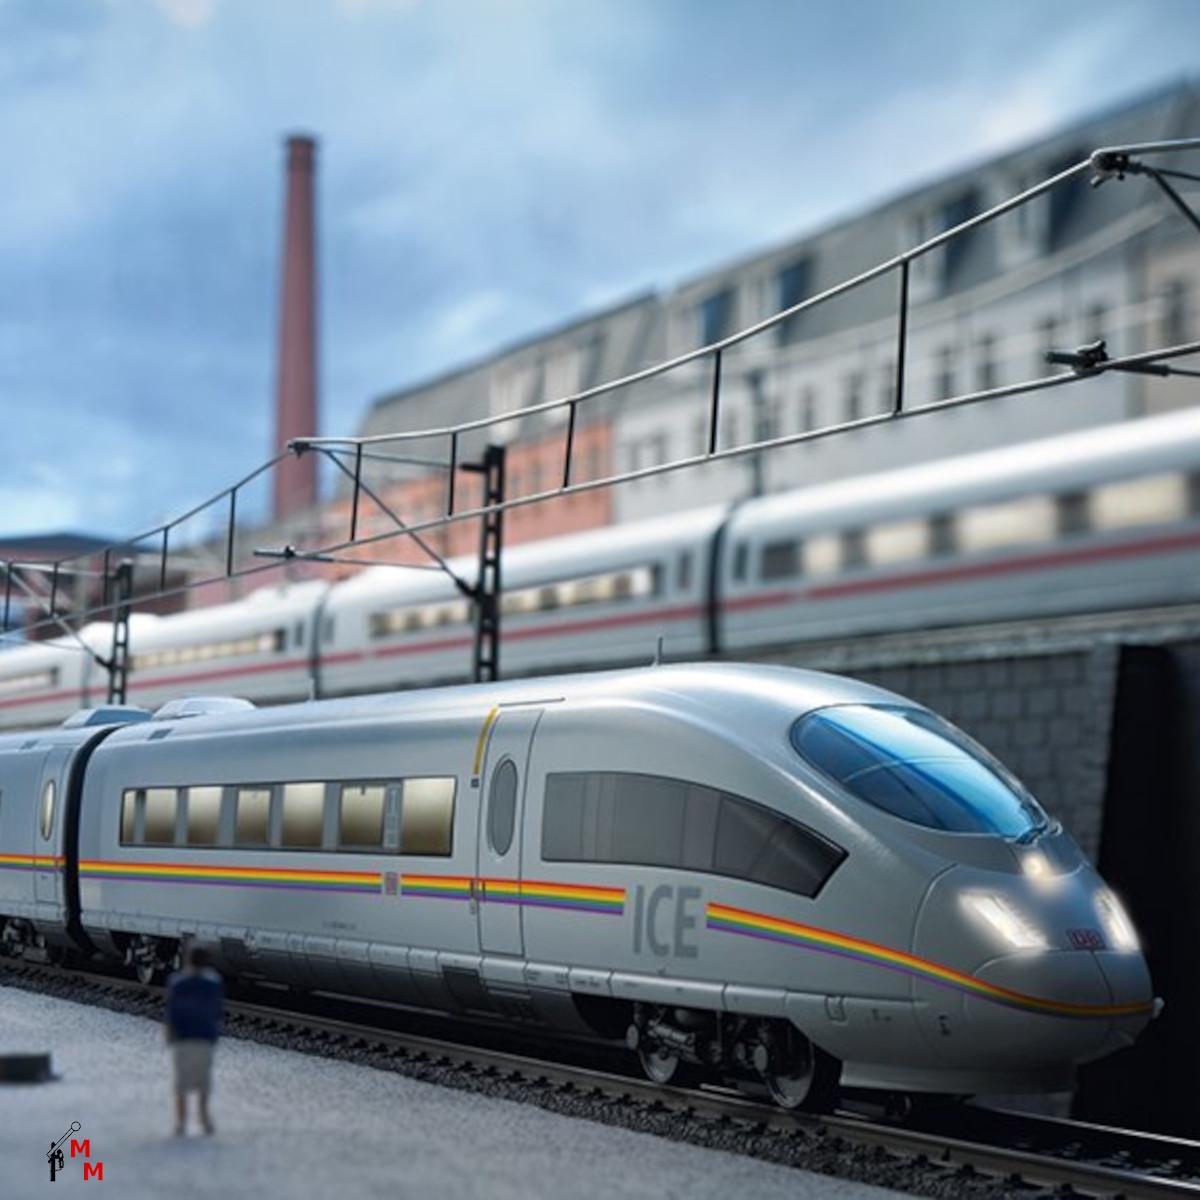 (Neu) Märklin 37784 Triebwagenzug ICE 3 railbow,